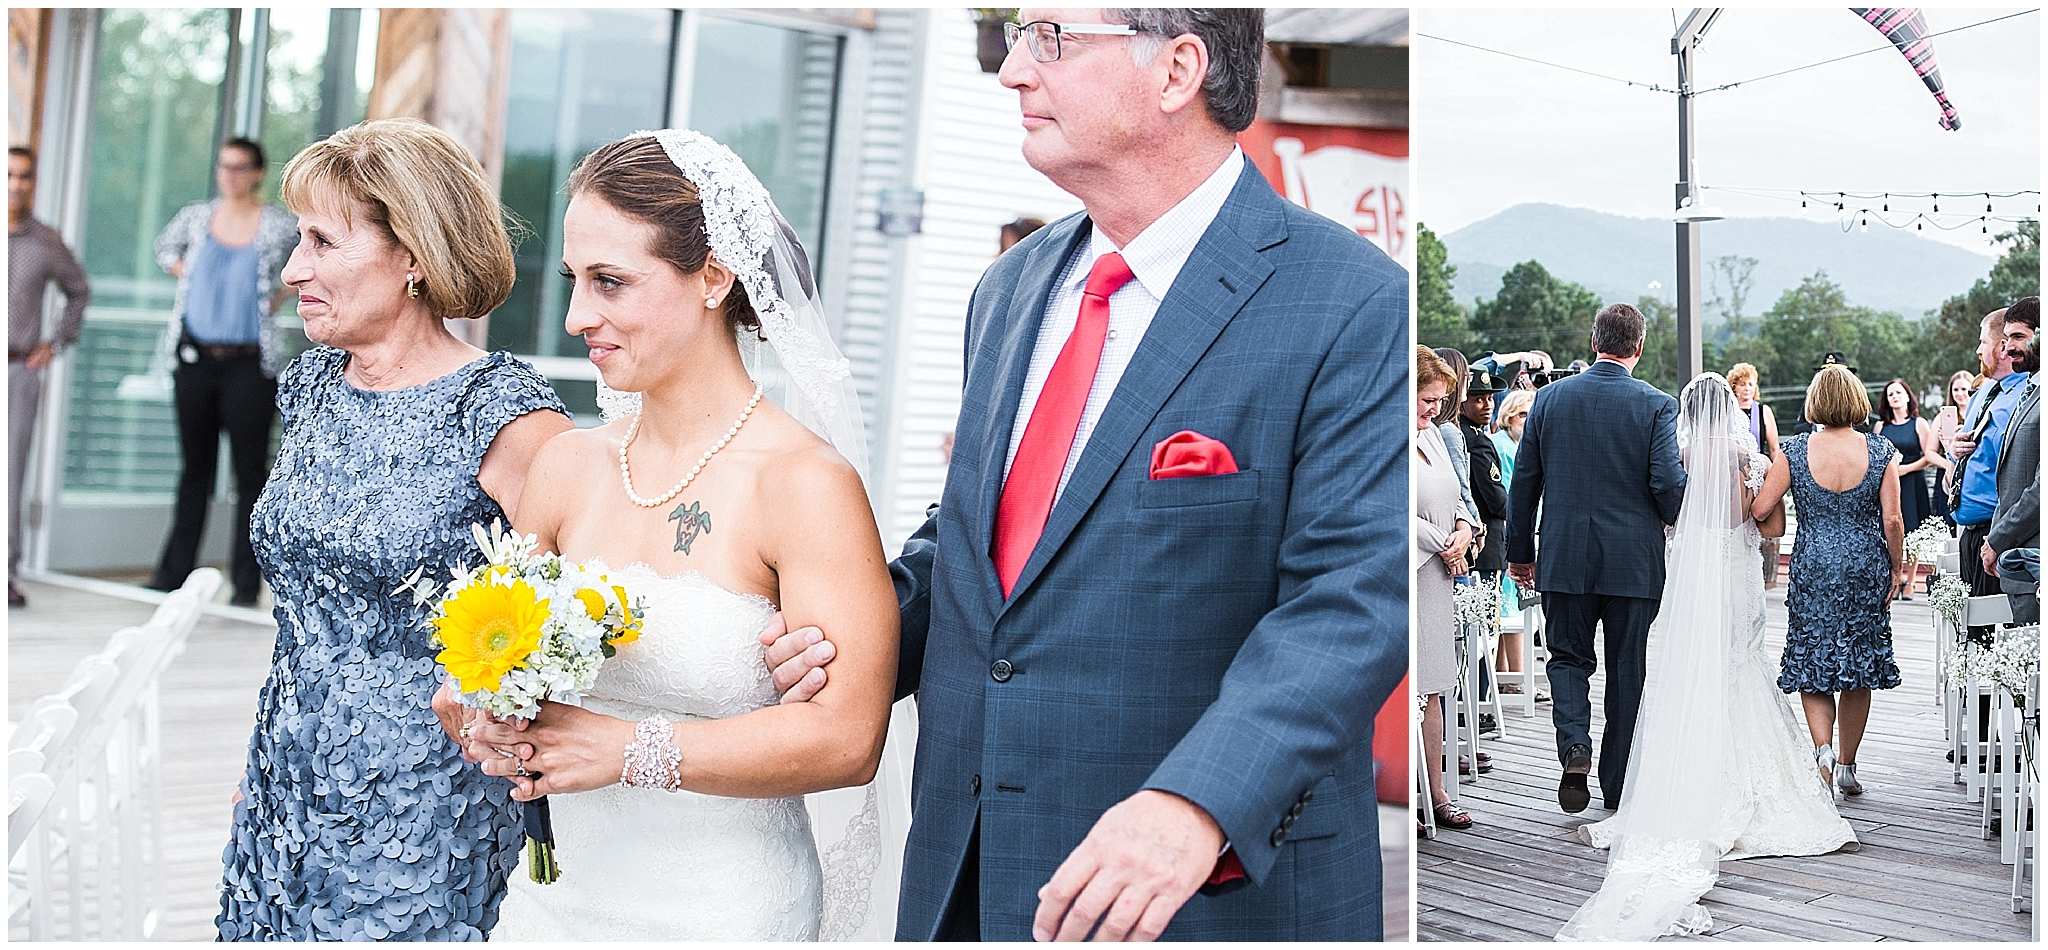 Wedding_Asheville_Highland_Brewing_Photographer_14.jpg